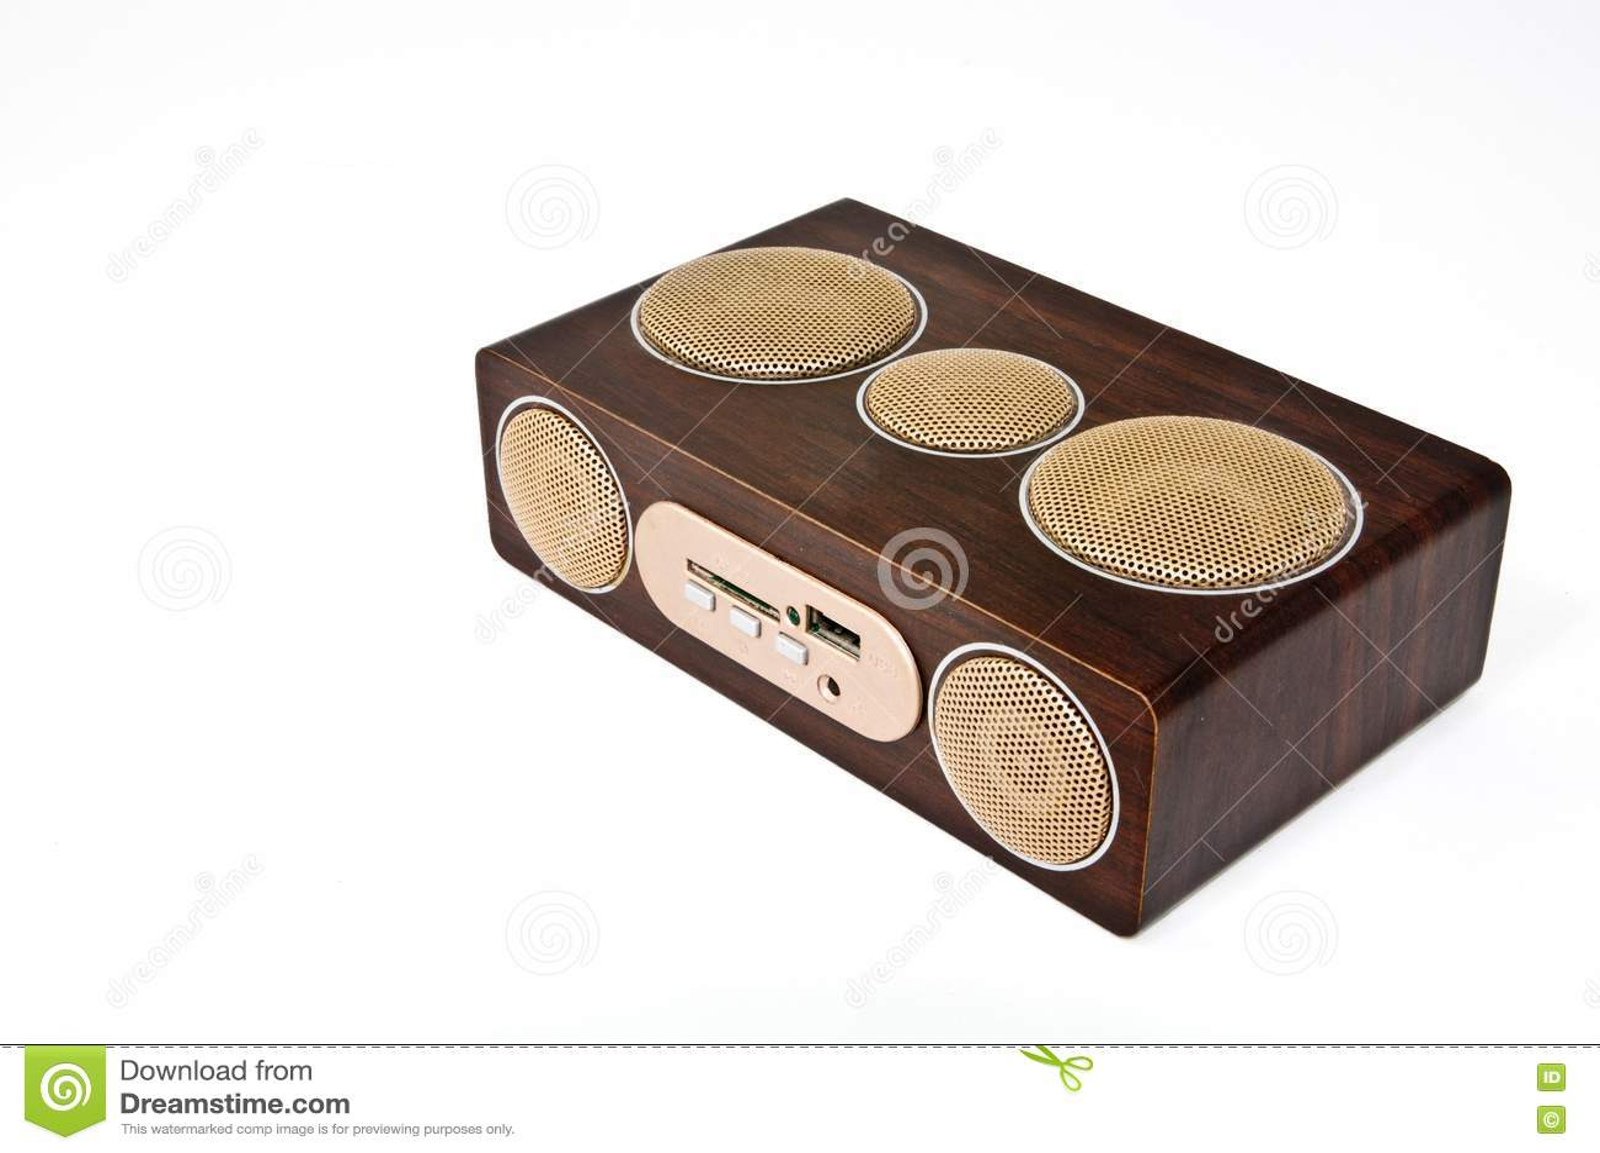 SCOSCHE SE69R x Speaker Enclosures - m